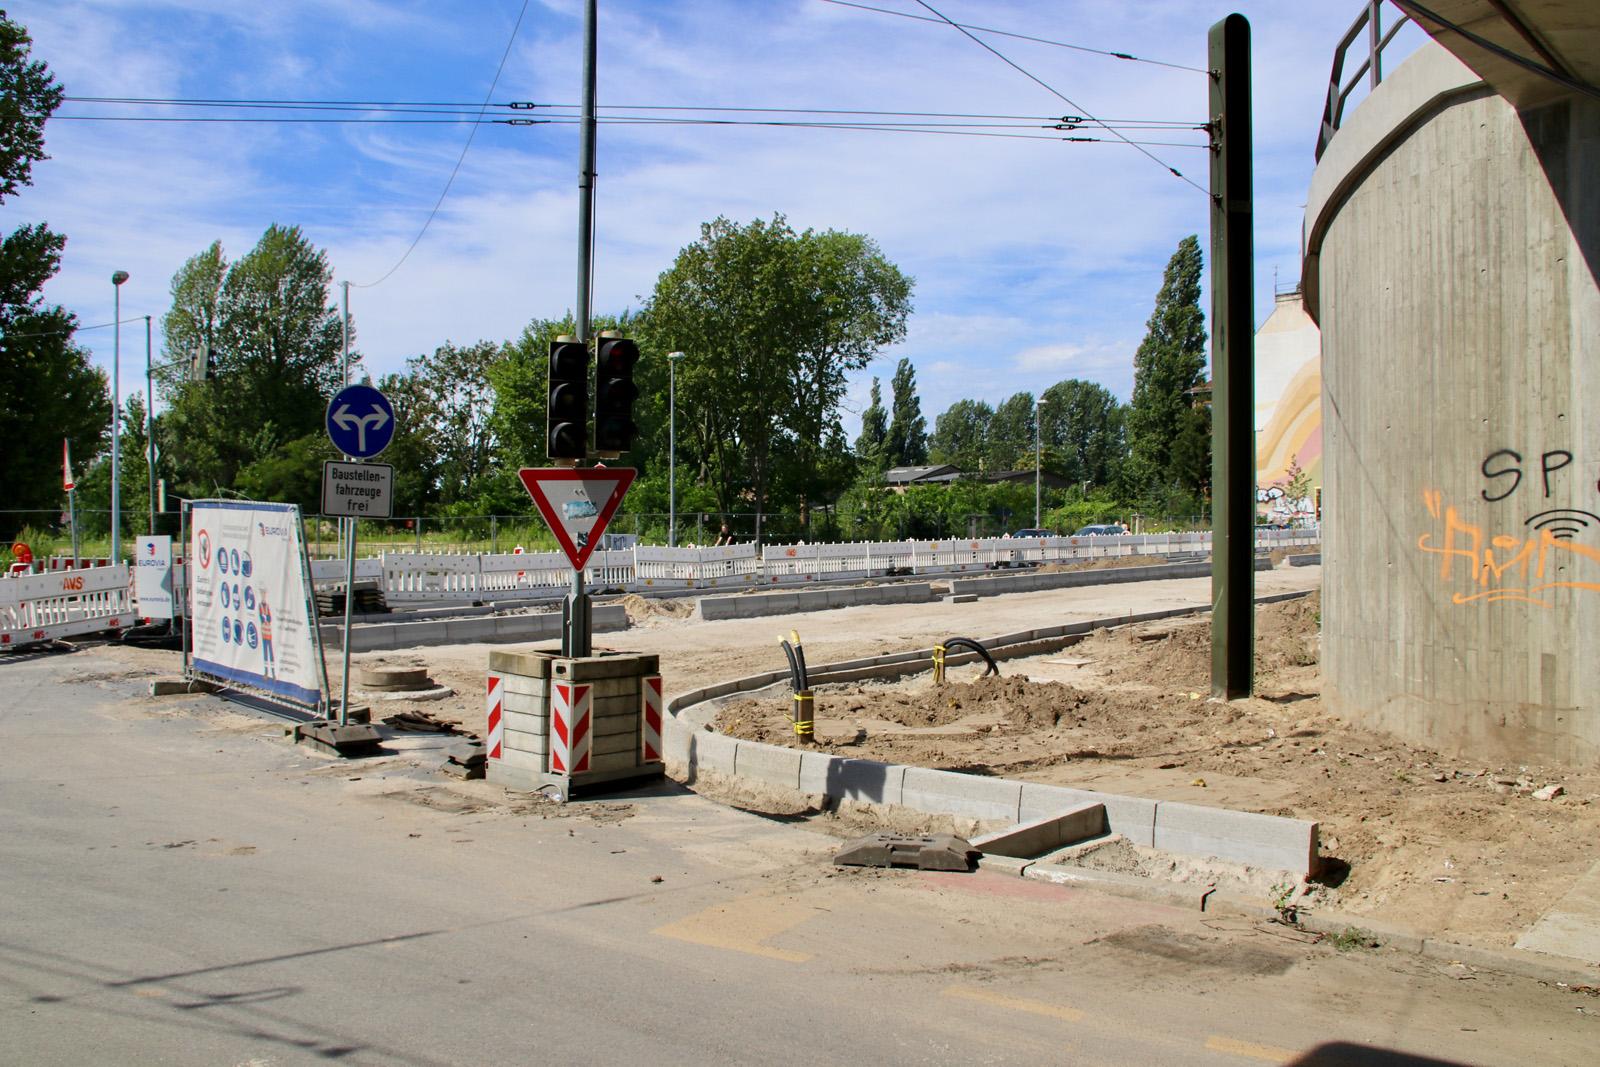 baustelle-ostkreuz-august-2017-07.jpg